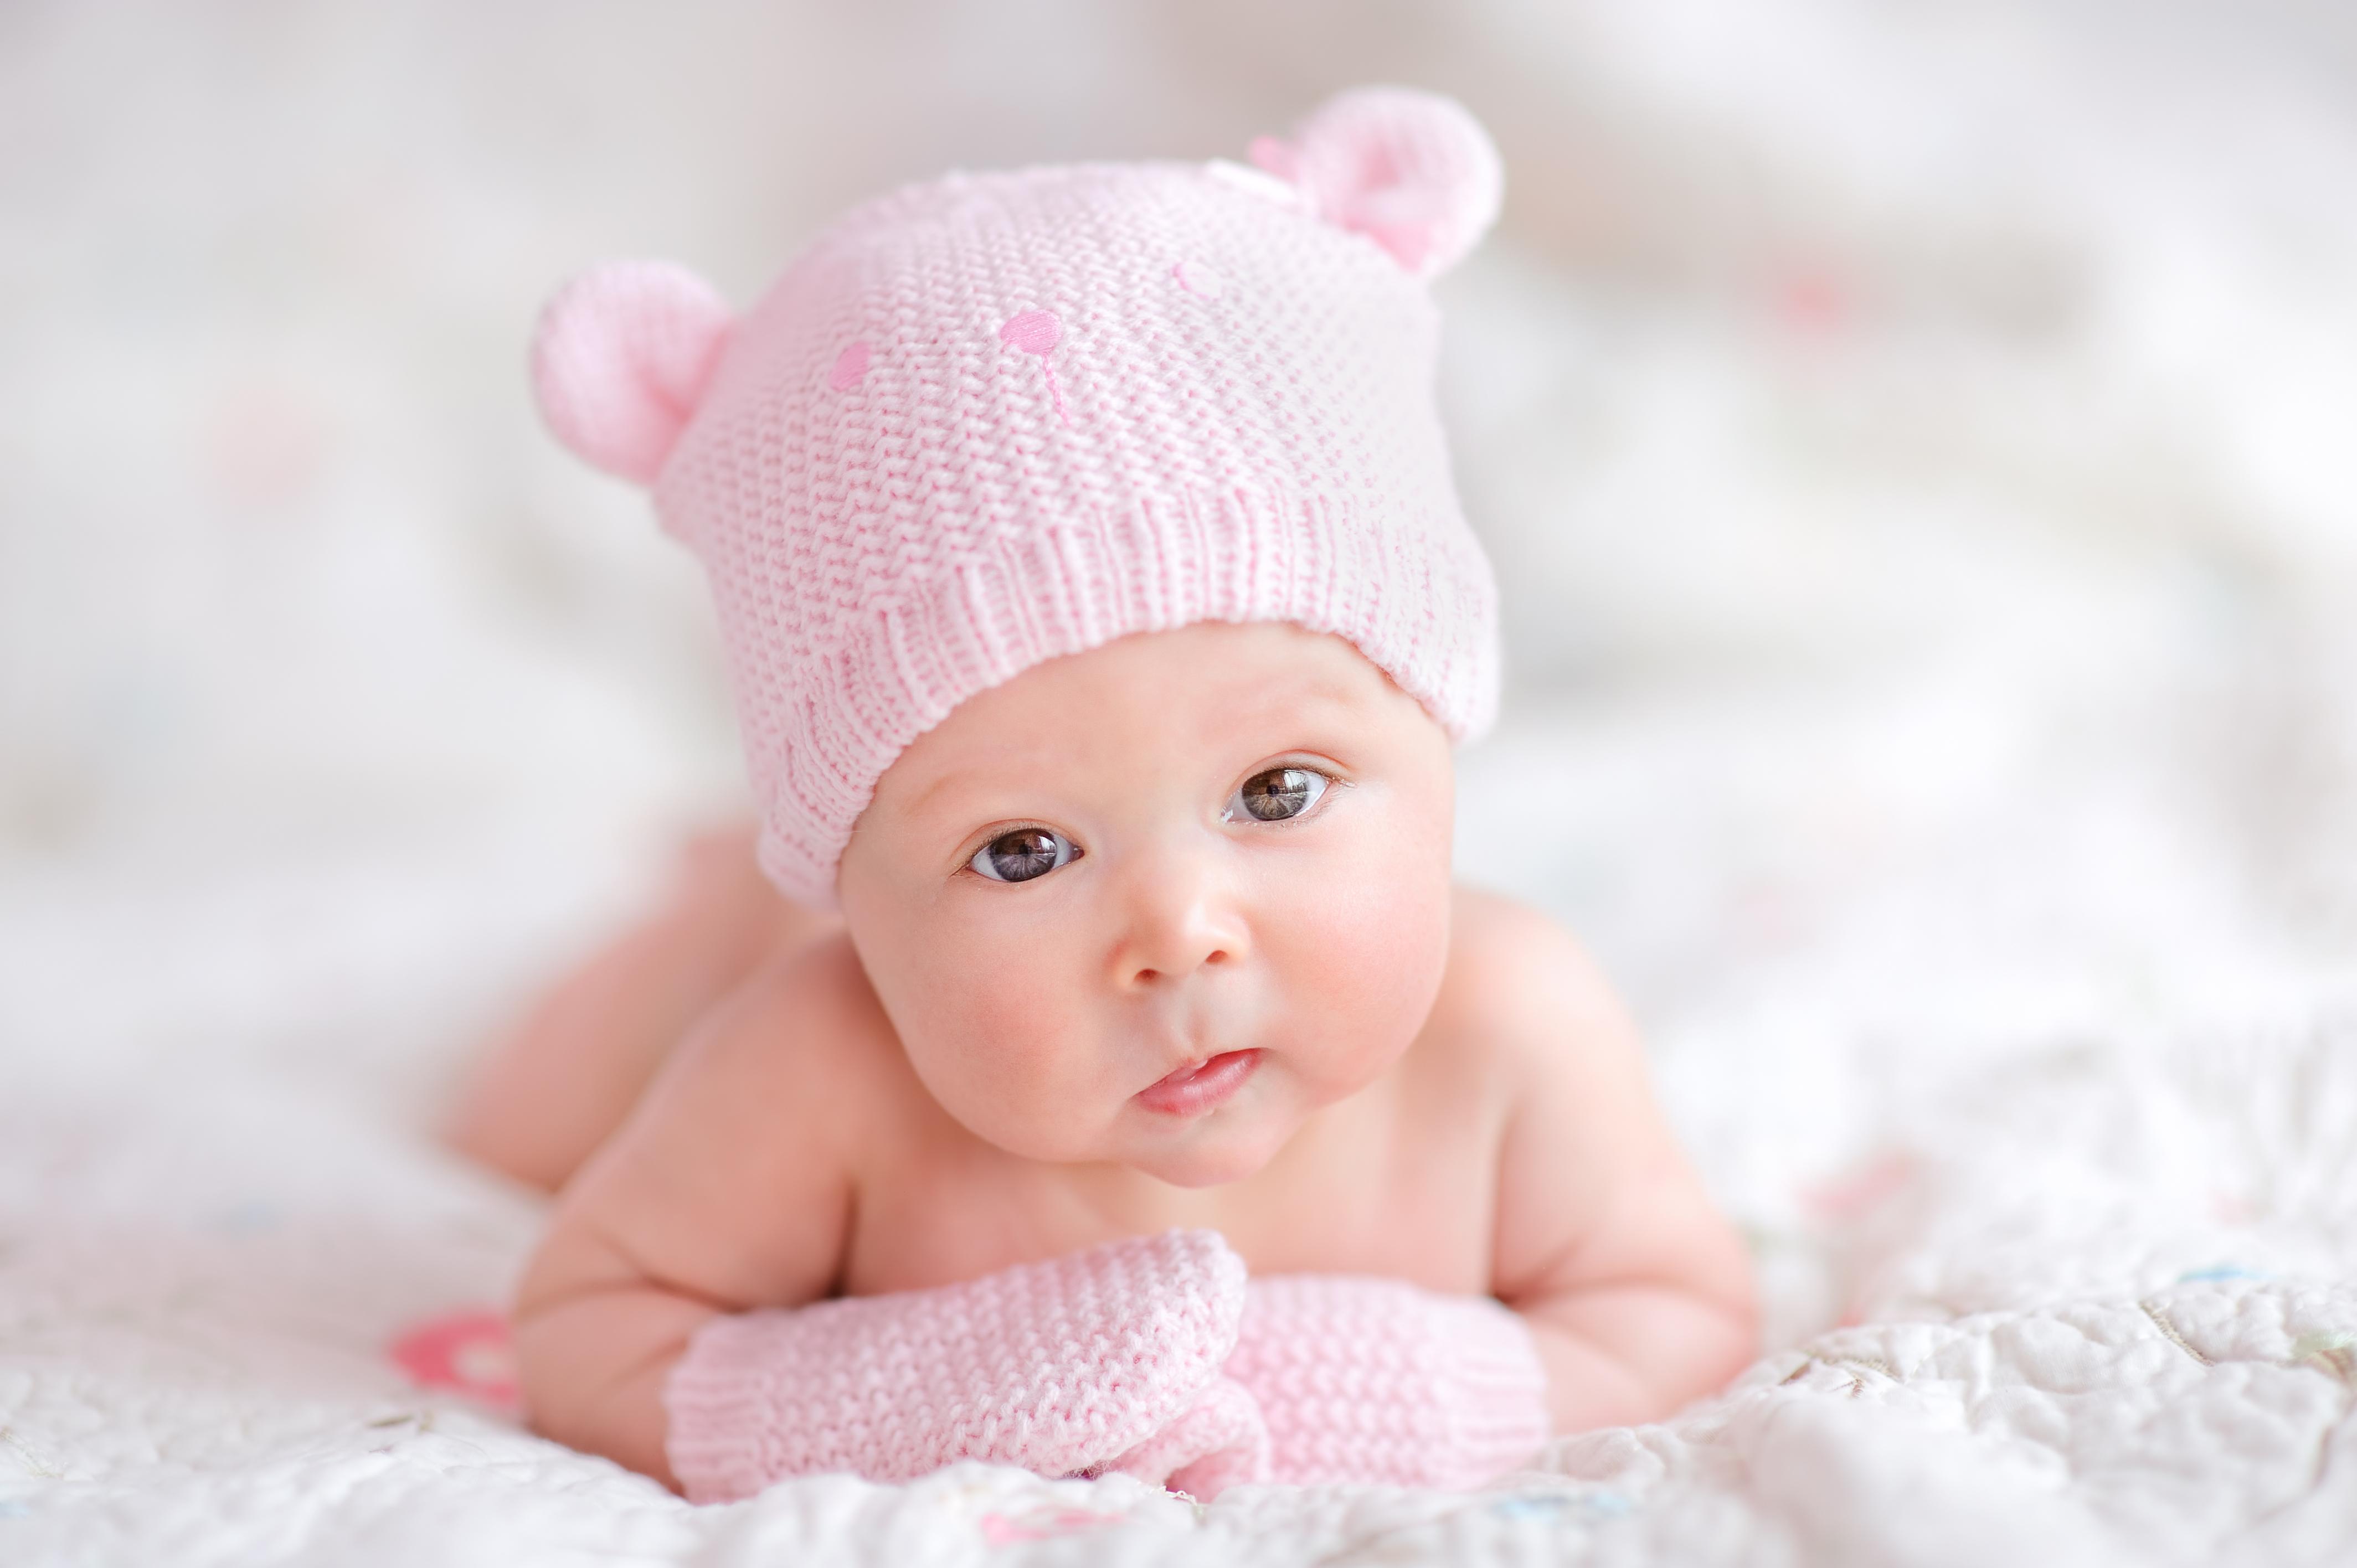 manusi nou nascutului